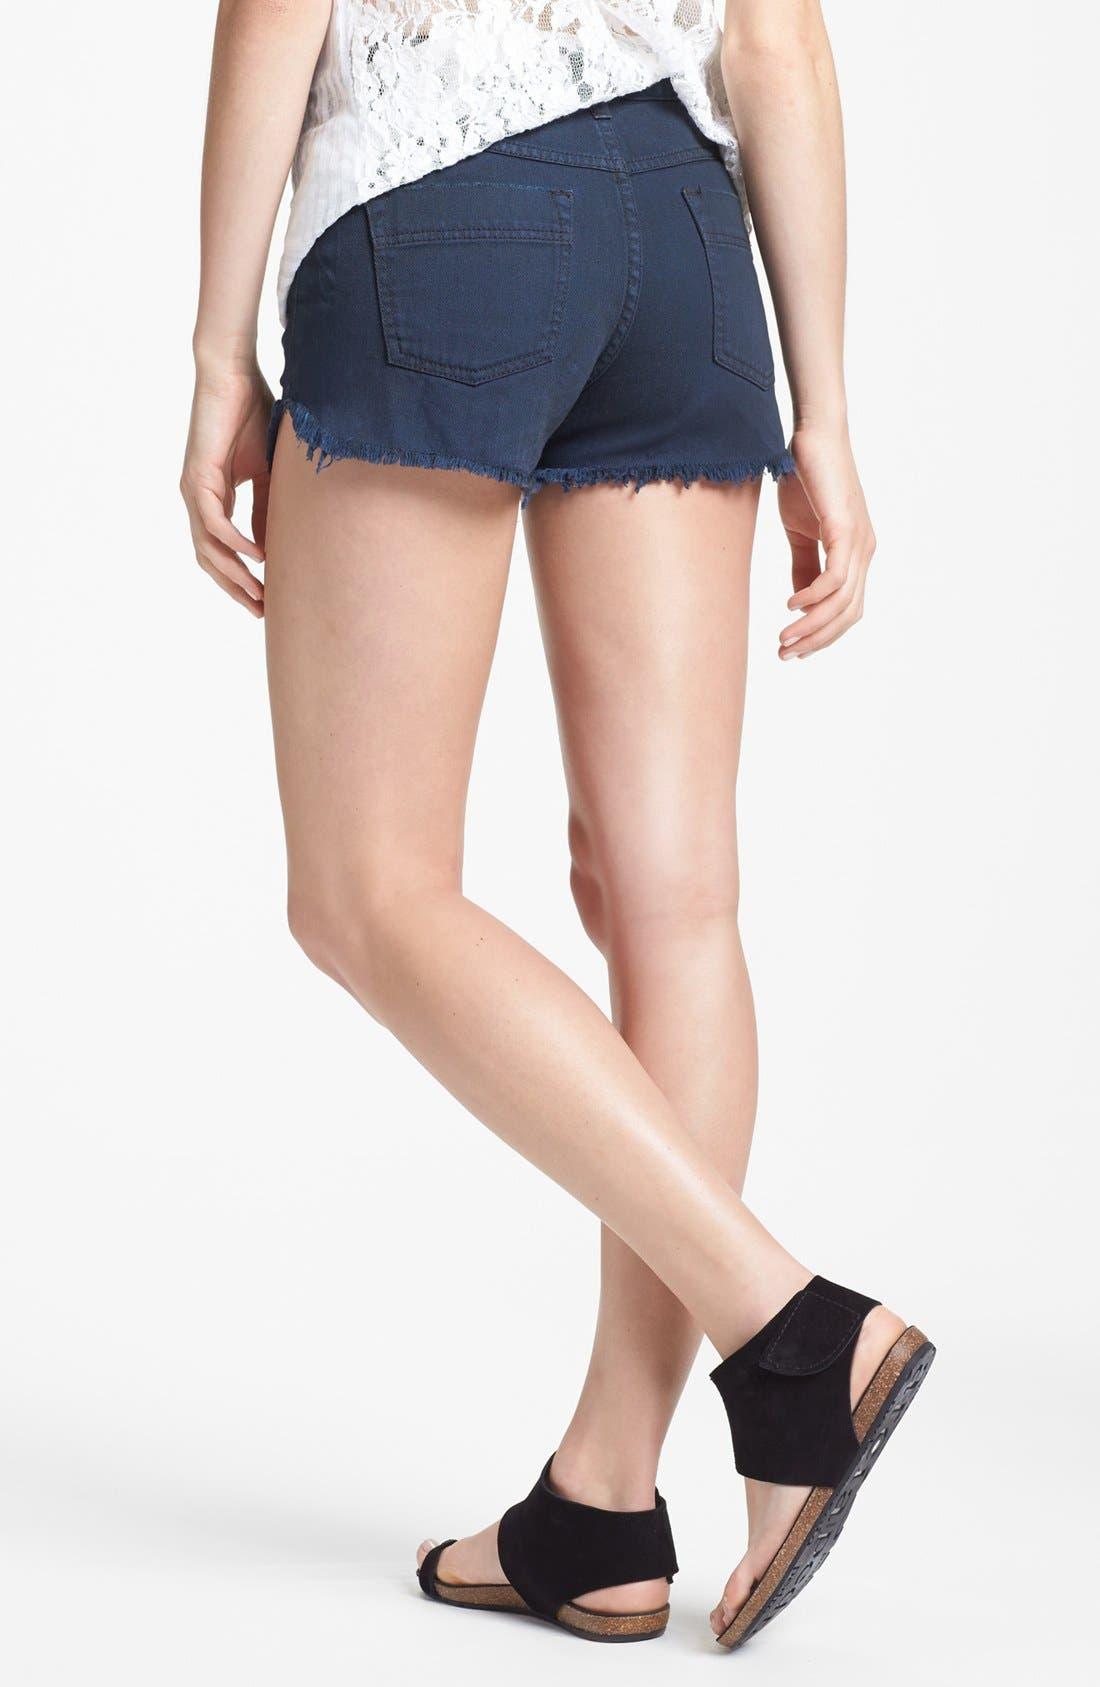 Alternate Image 2  - Free People 'Dolphin' Cutoff Denim Shorts (Blue/Black)